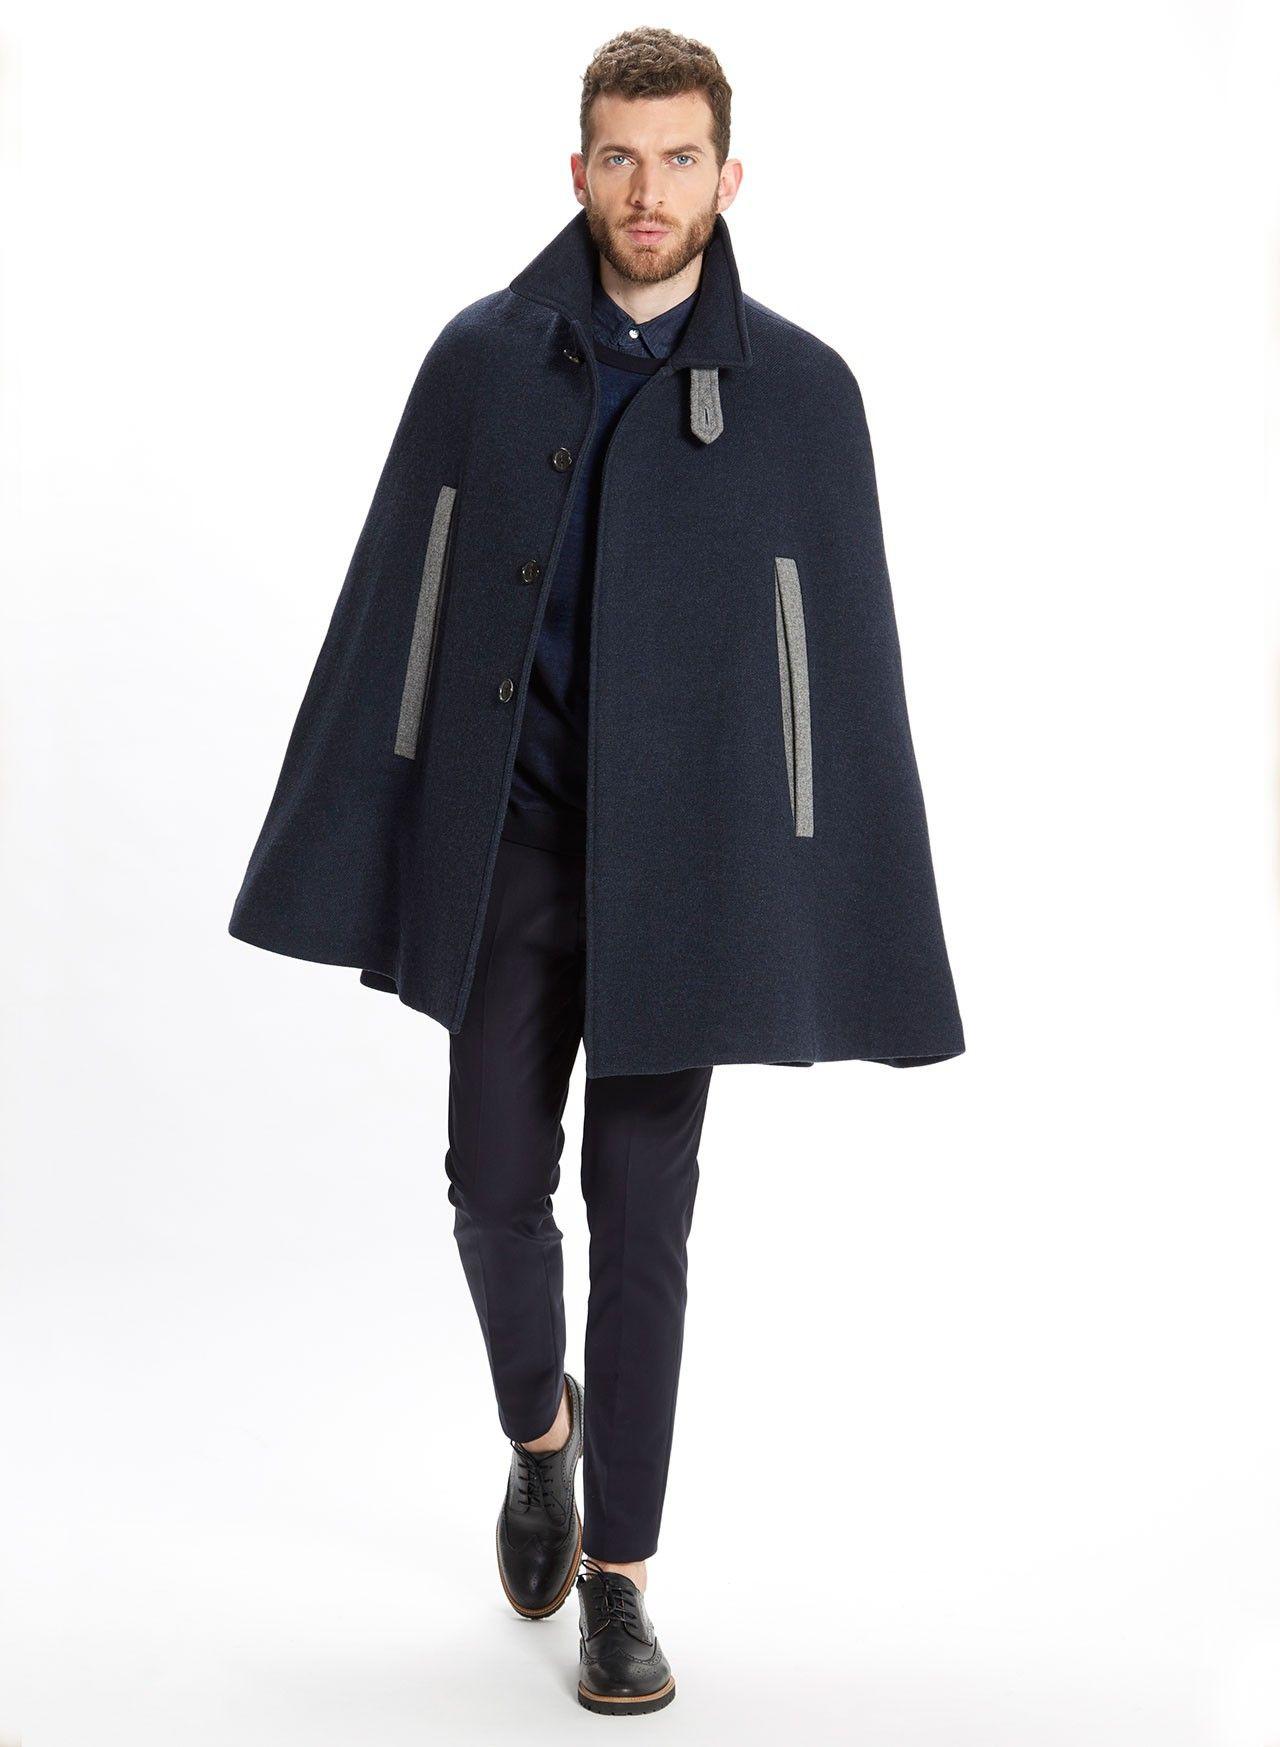 Cape Coat for Men